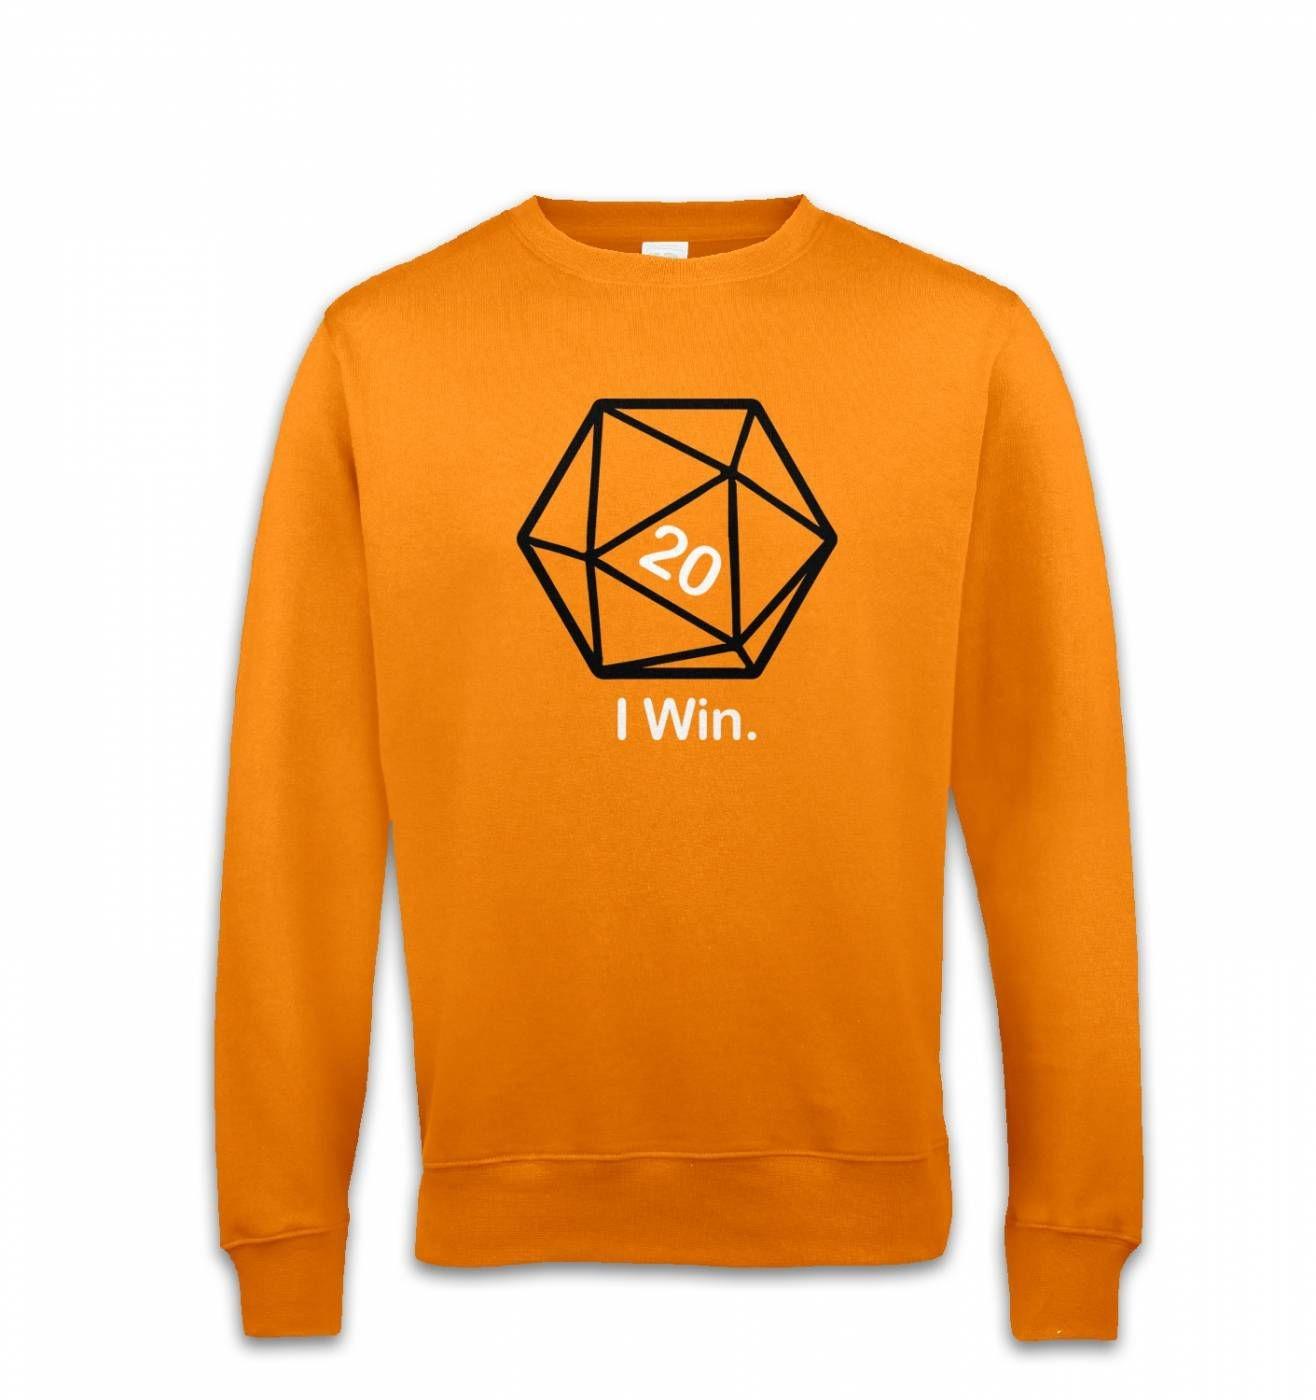 D20 I Win sweatshirt